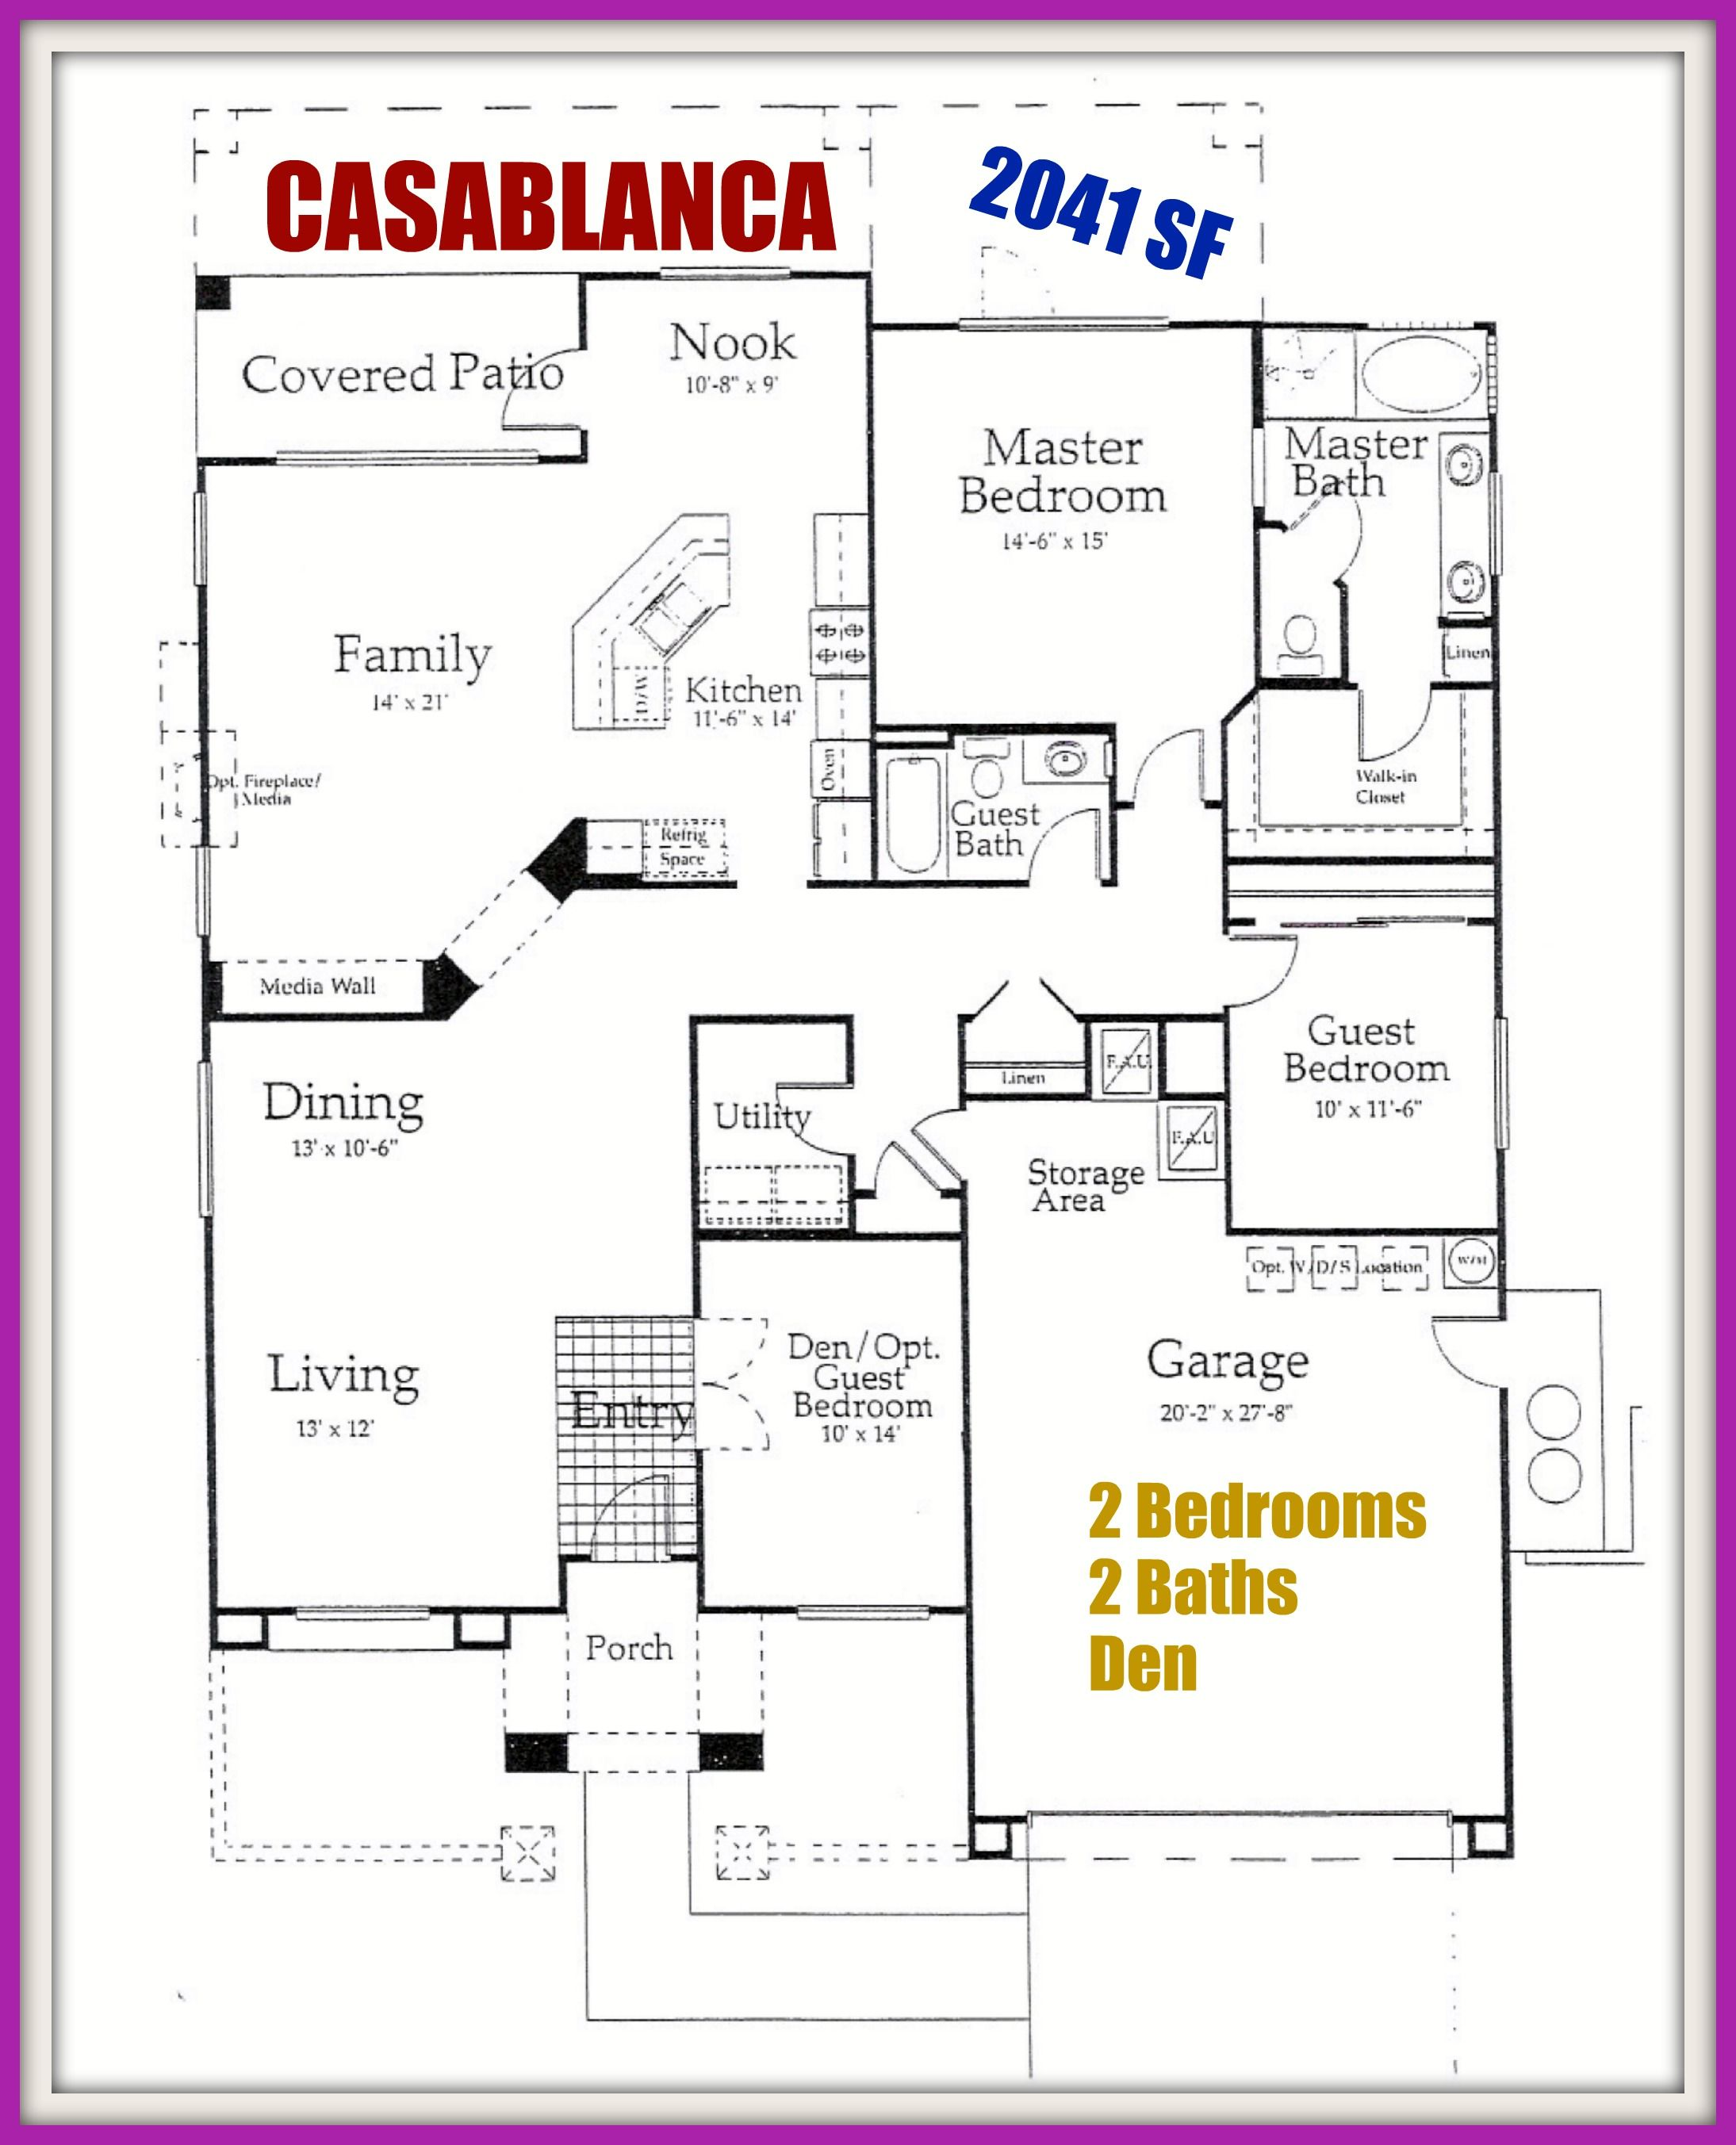 Del Webb SUN CITY PALM DESERT CA Floor plan for the CASABLANCA